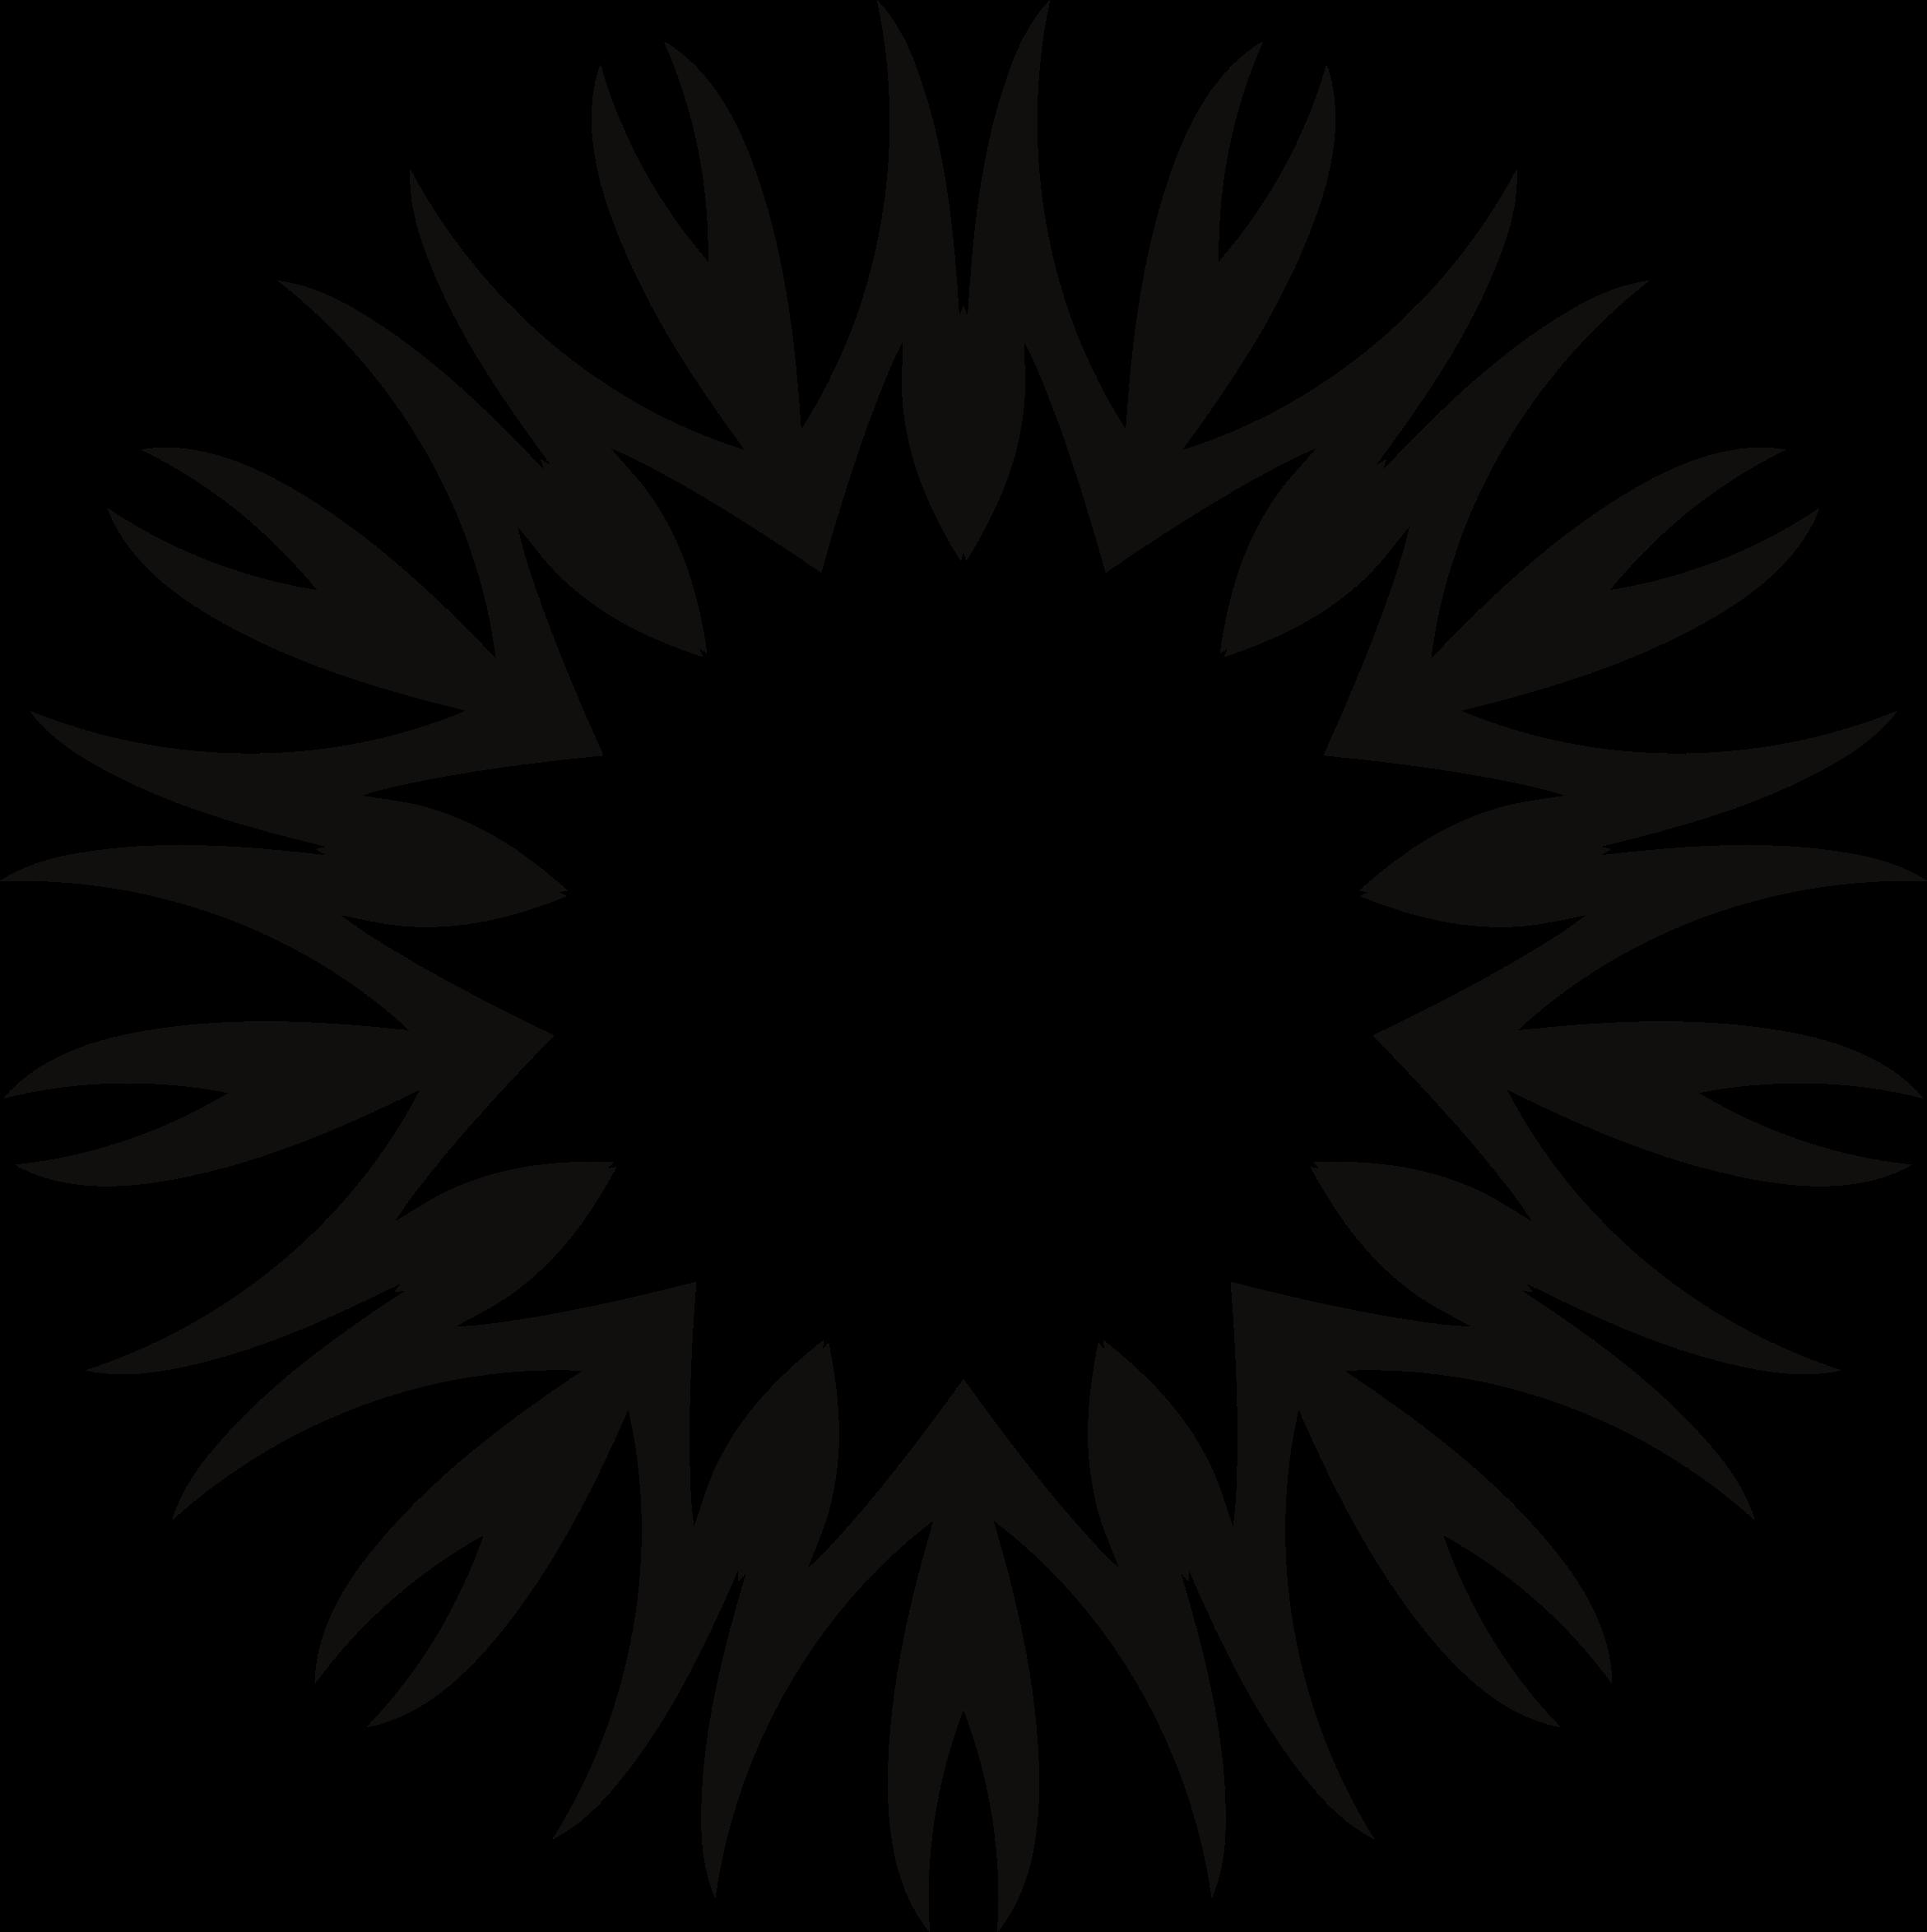 Black Sun PNG - 155160